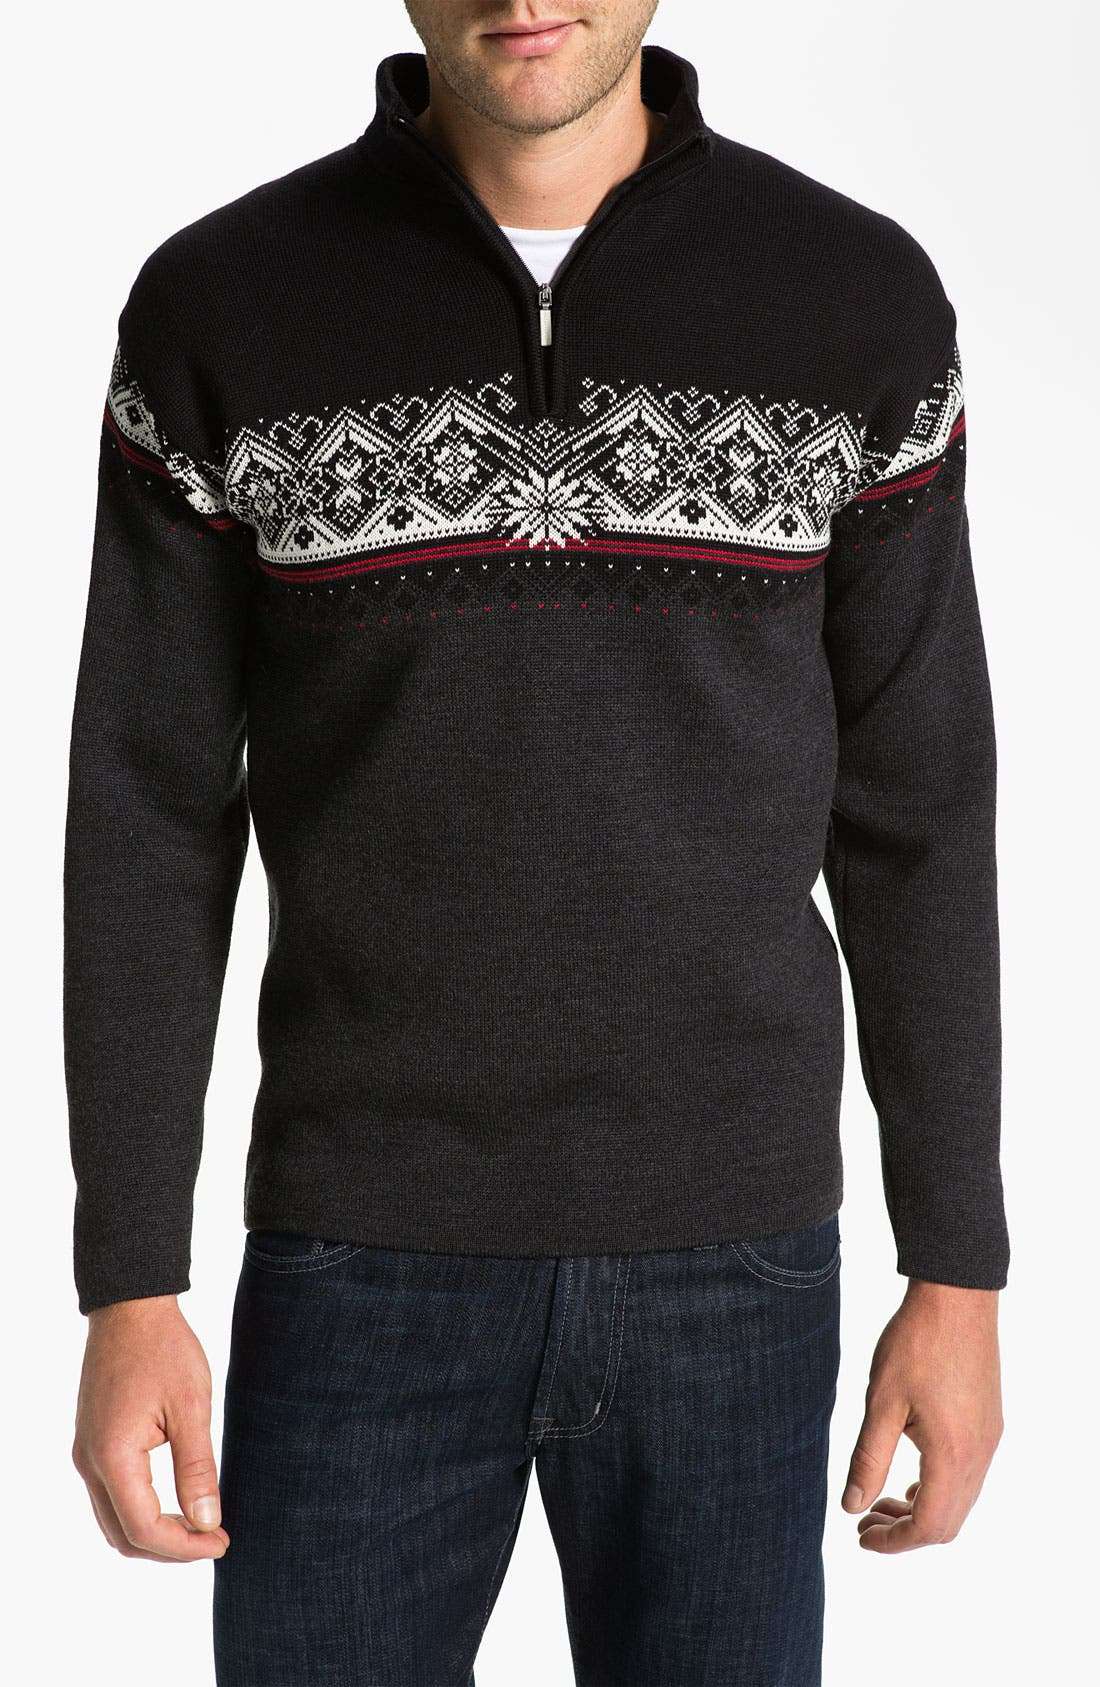 Alternate Image 1 Selected - Dale of Norway 'St Moritz' Quarter Zip Merino Wool Sweater